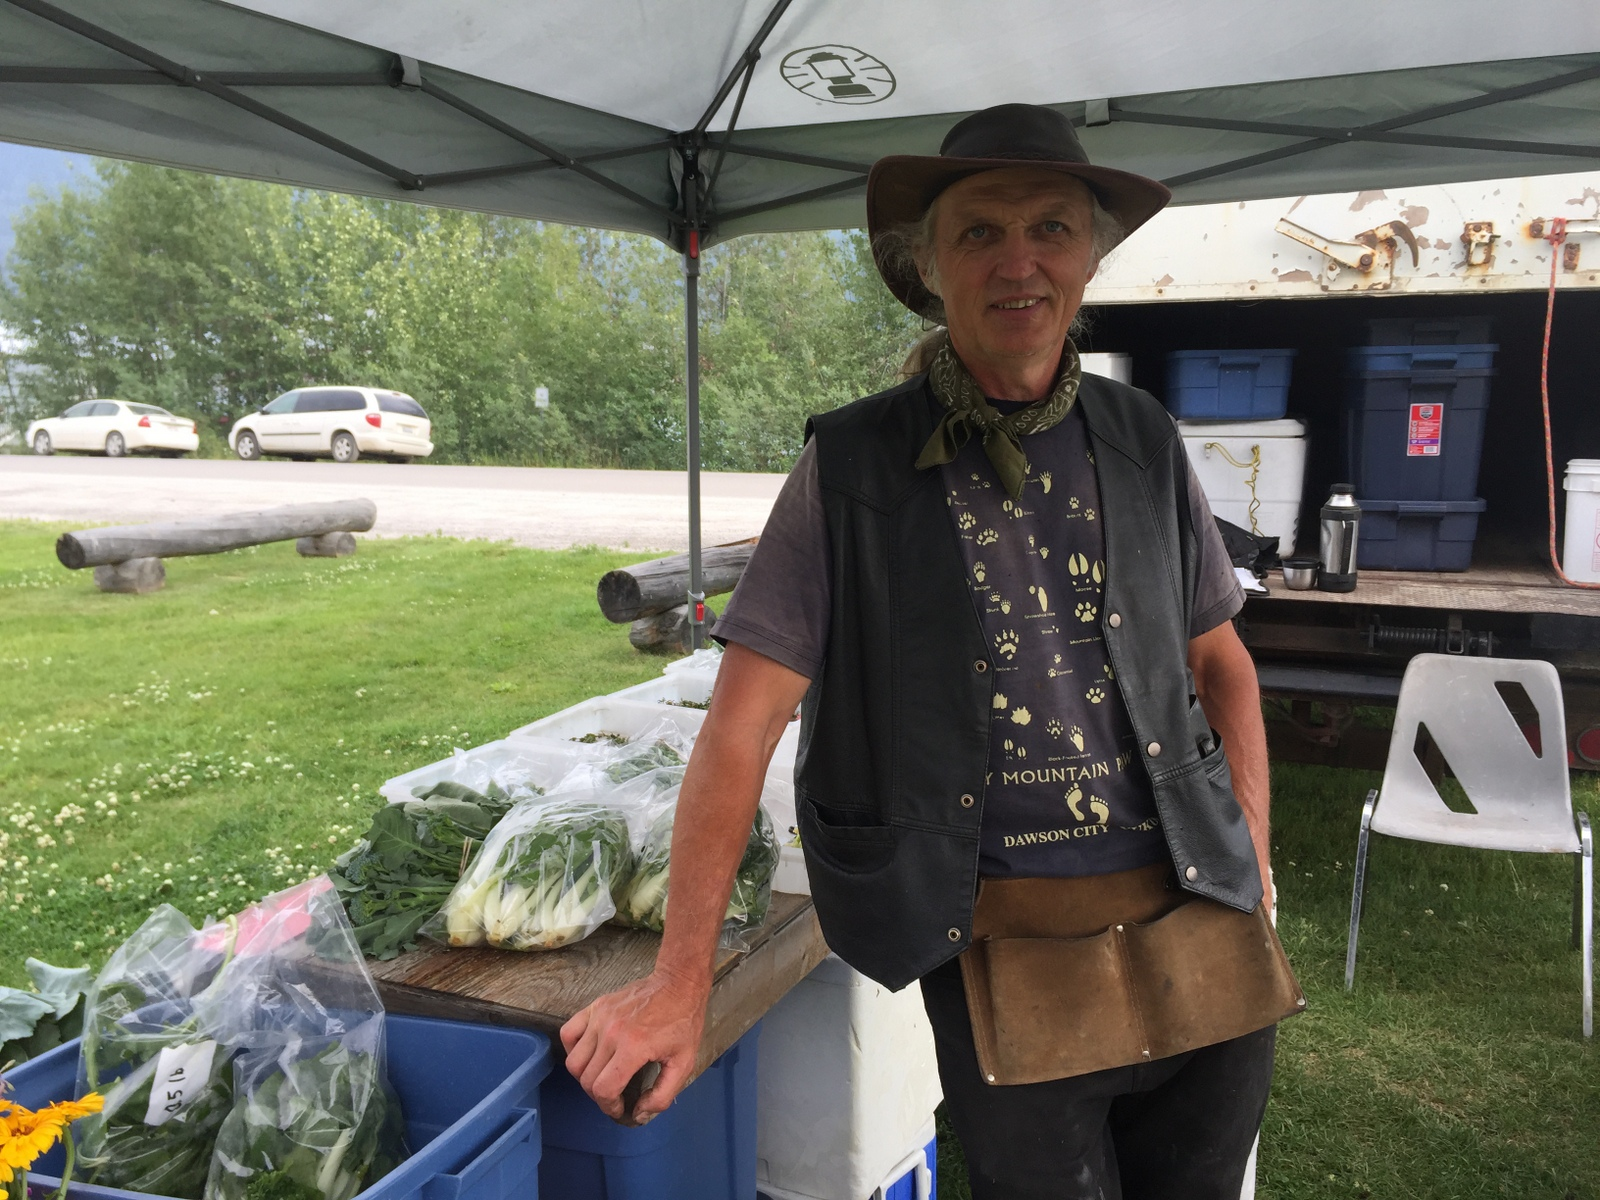 Otto Muehlbach grows organic vegetables outside Dawson City, Yukon. A very interesting guy. - JIM BYERS PHOTO